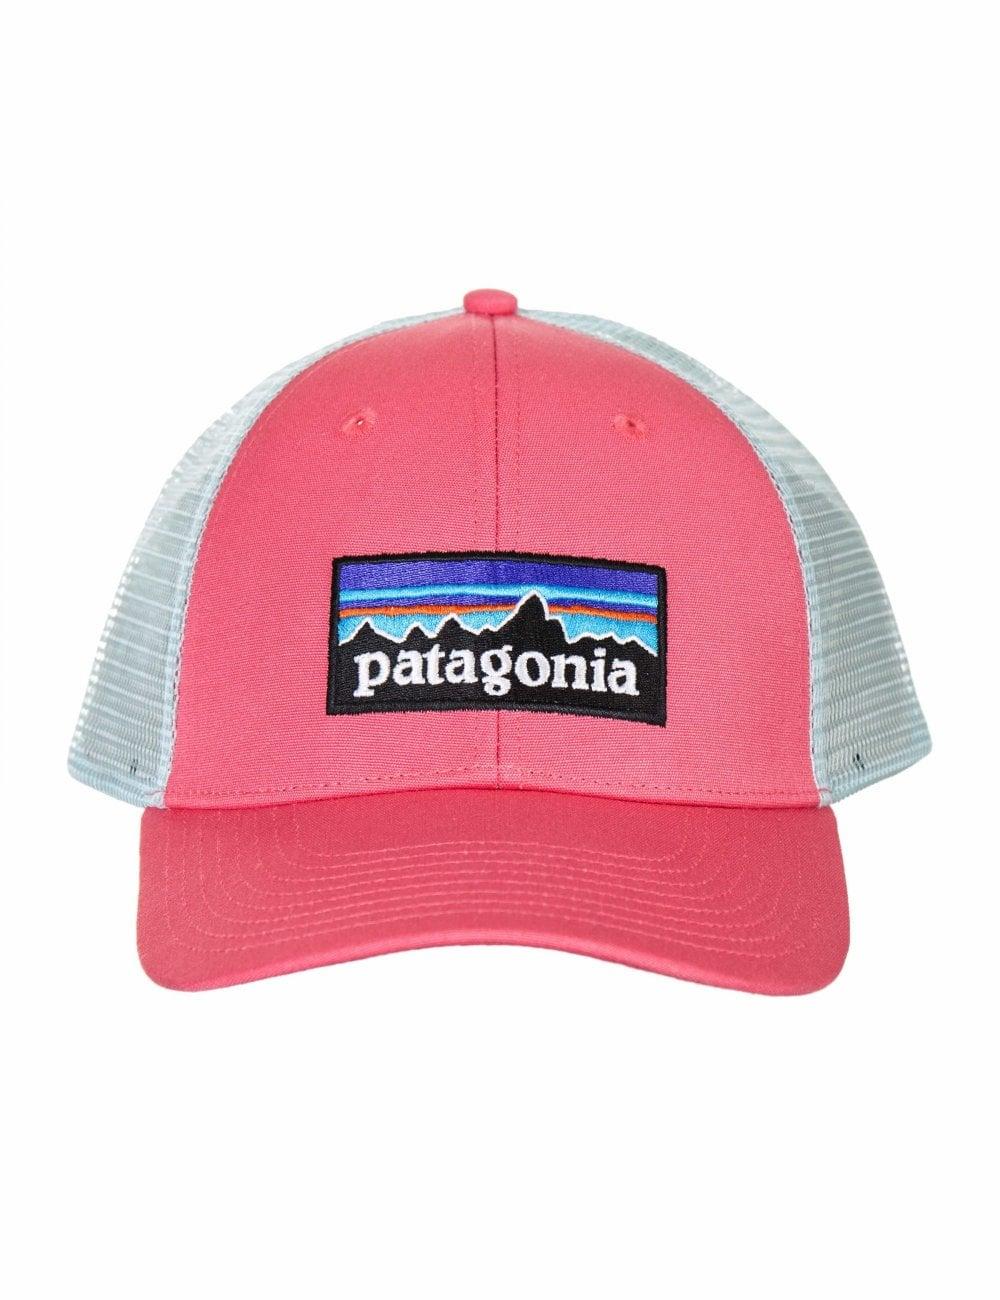 8f759b06e3b34 Patagonia P-6 Logo LoPro Trucker Hat - Sticker Pink - Accessories ...